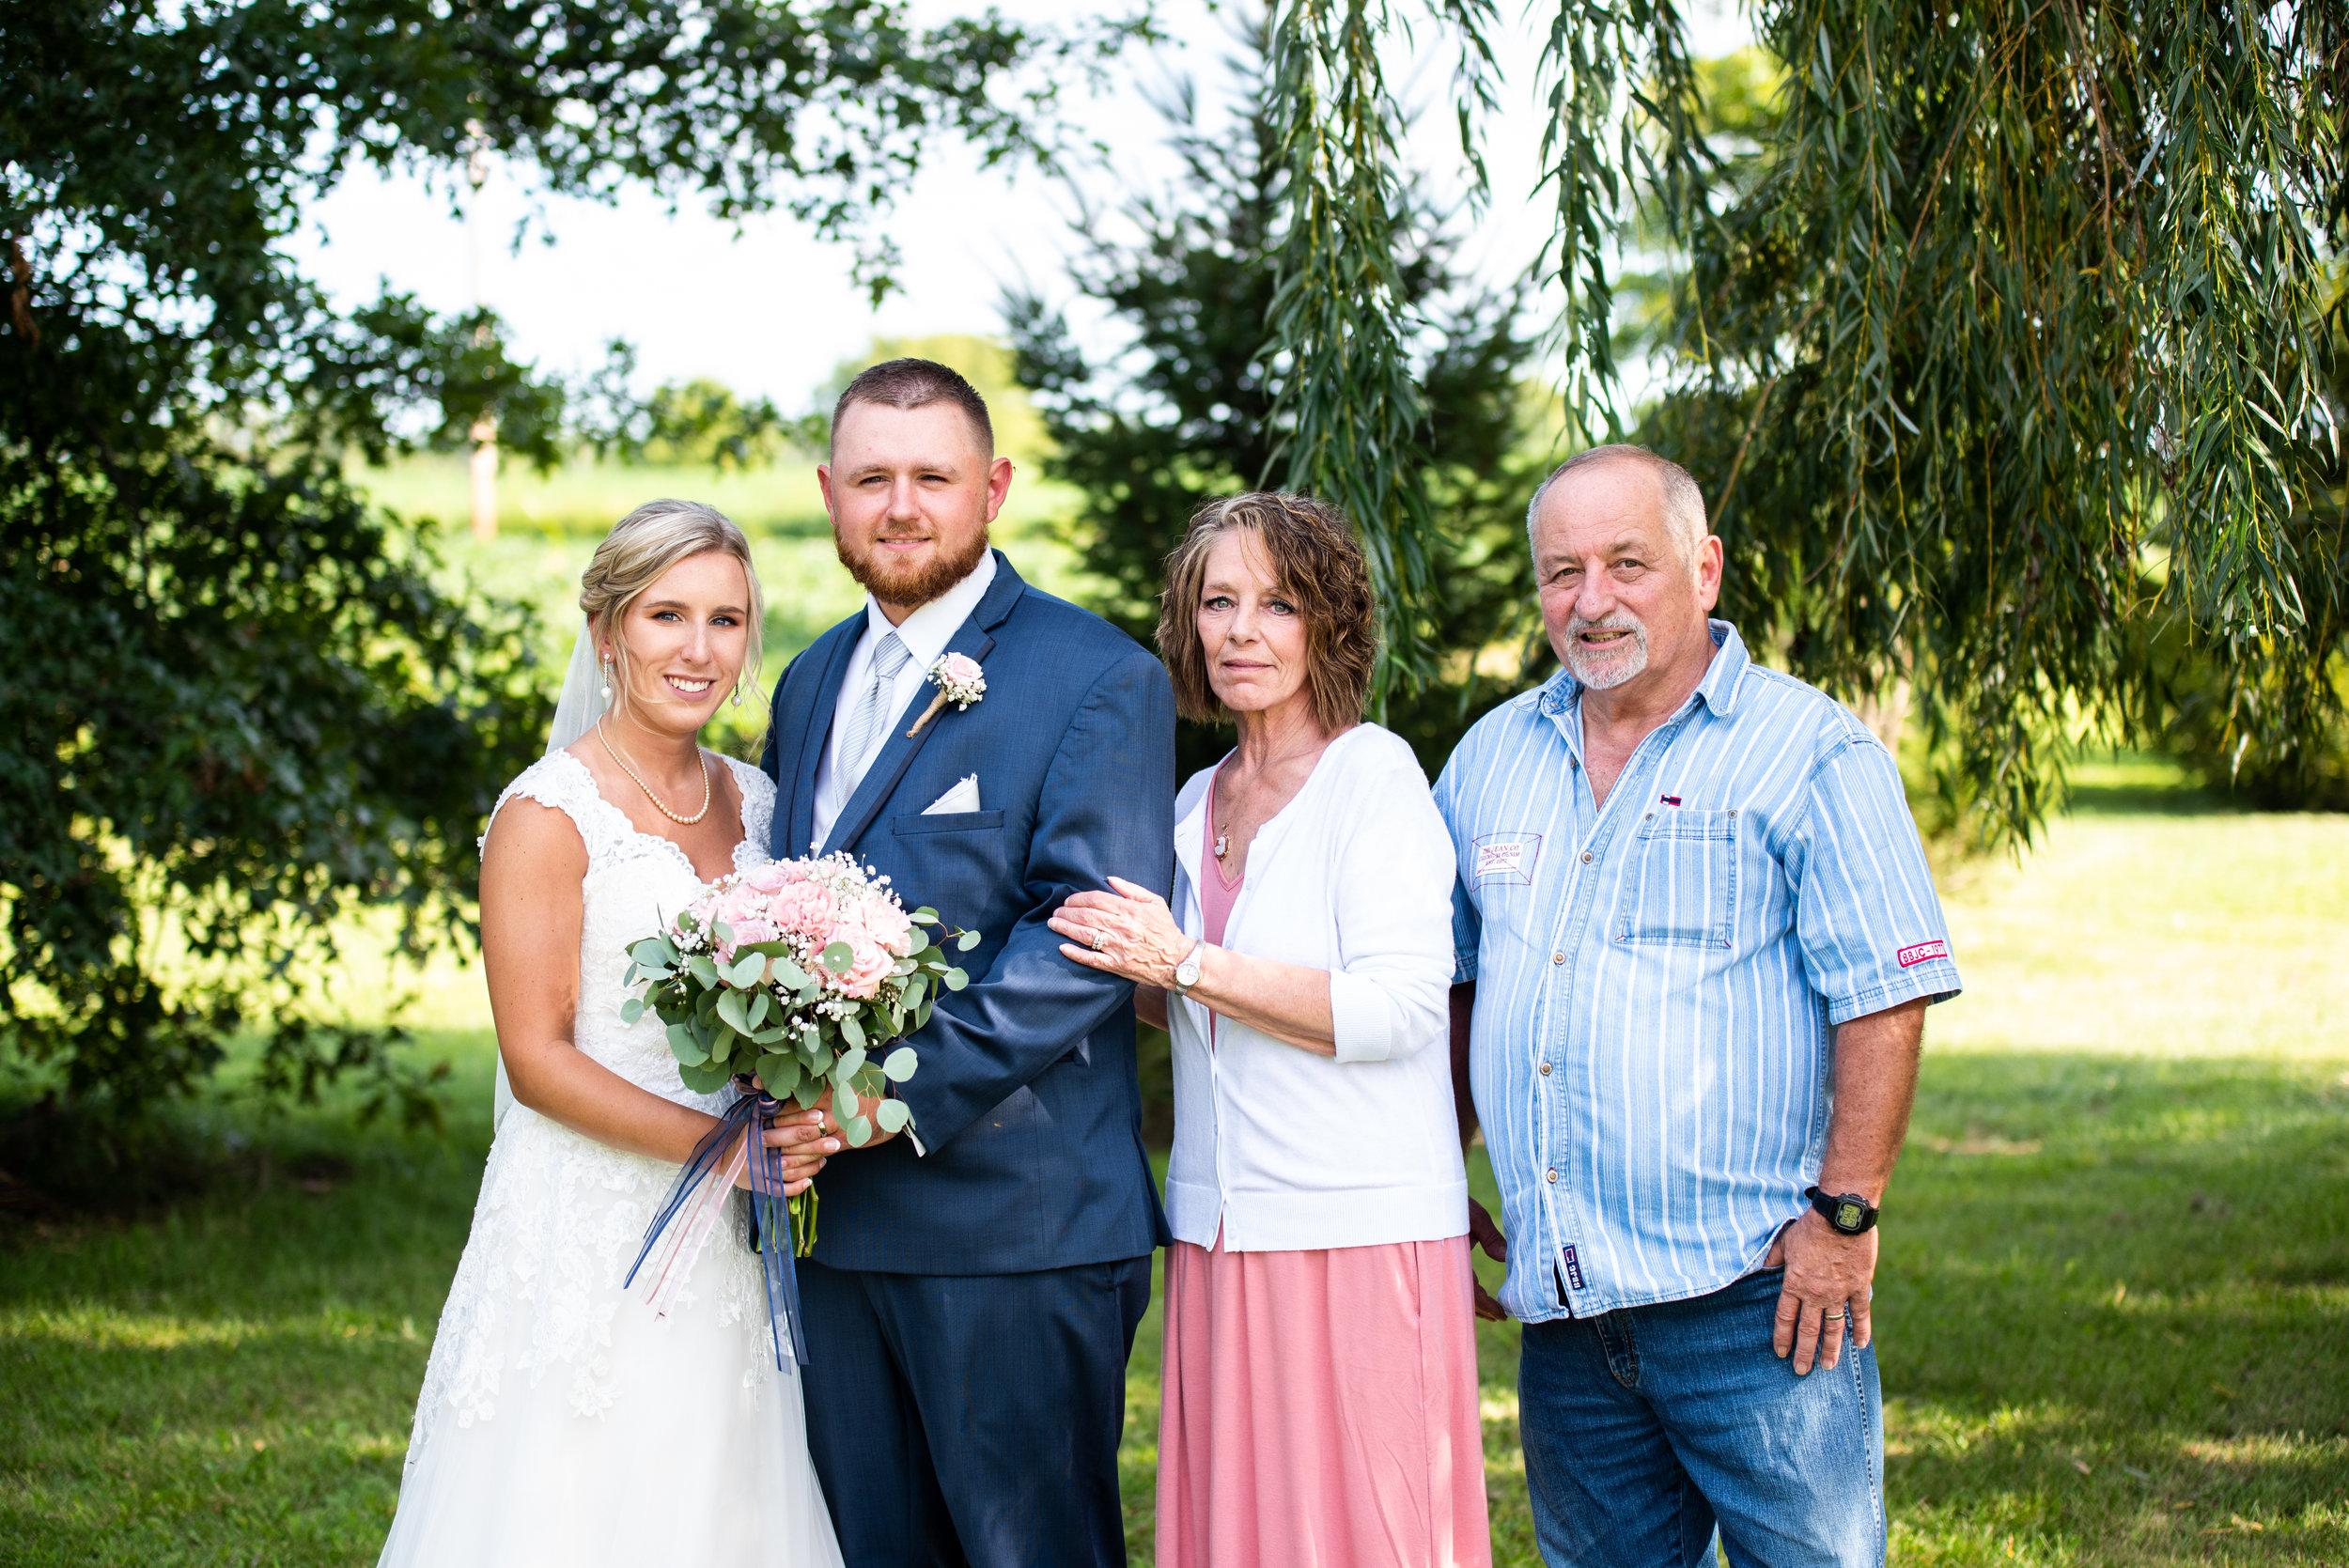 wedding (1 of 1)-120.jpg